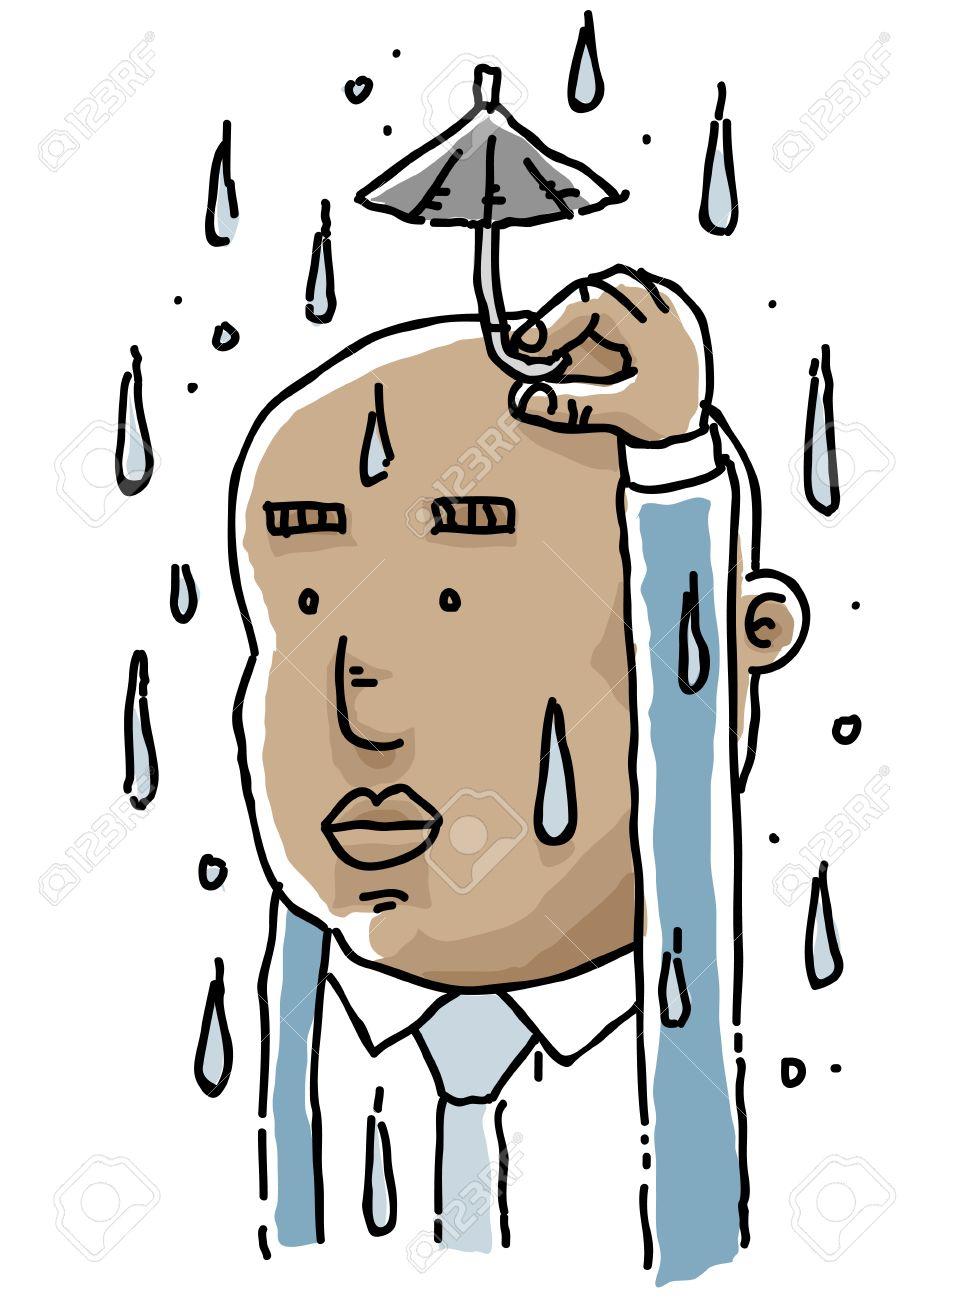 A cartoon businessman holding a tiny umbrella to protect himself